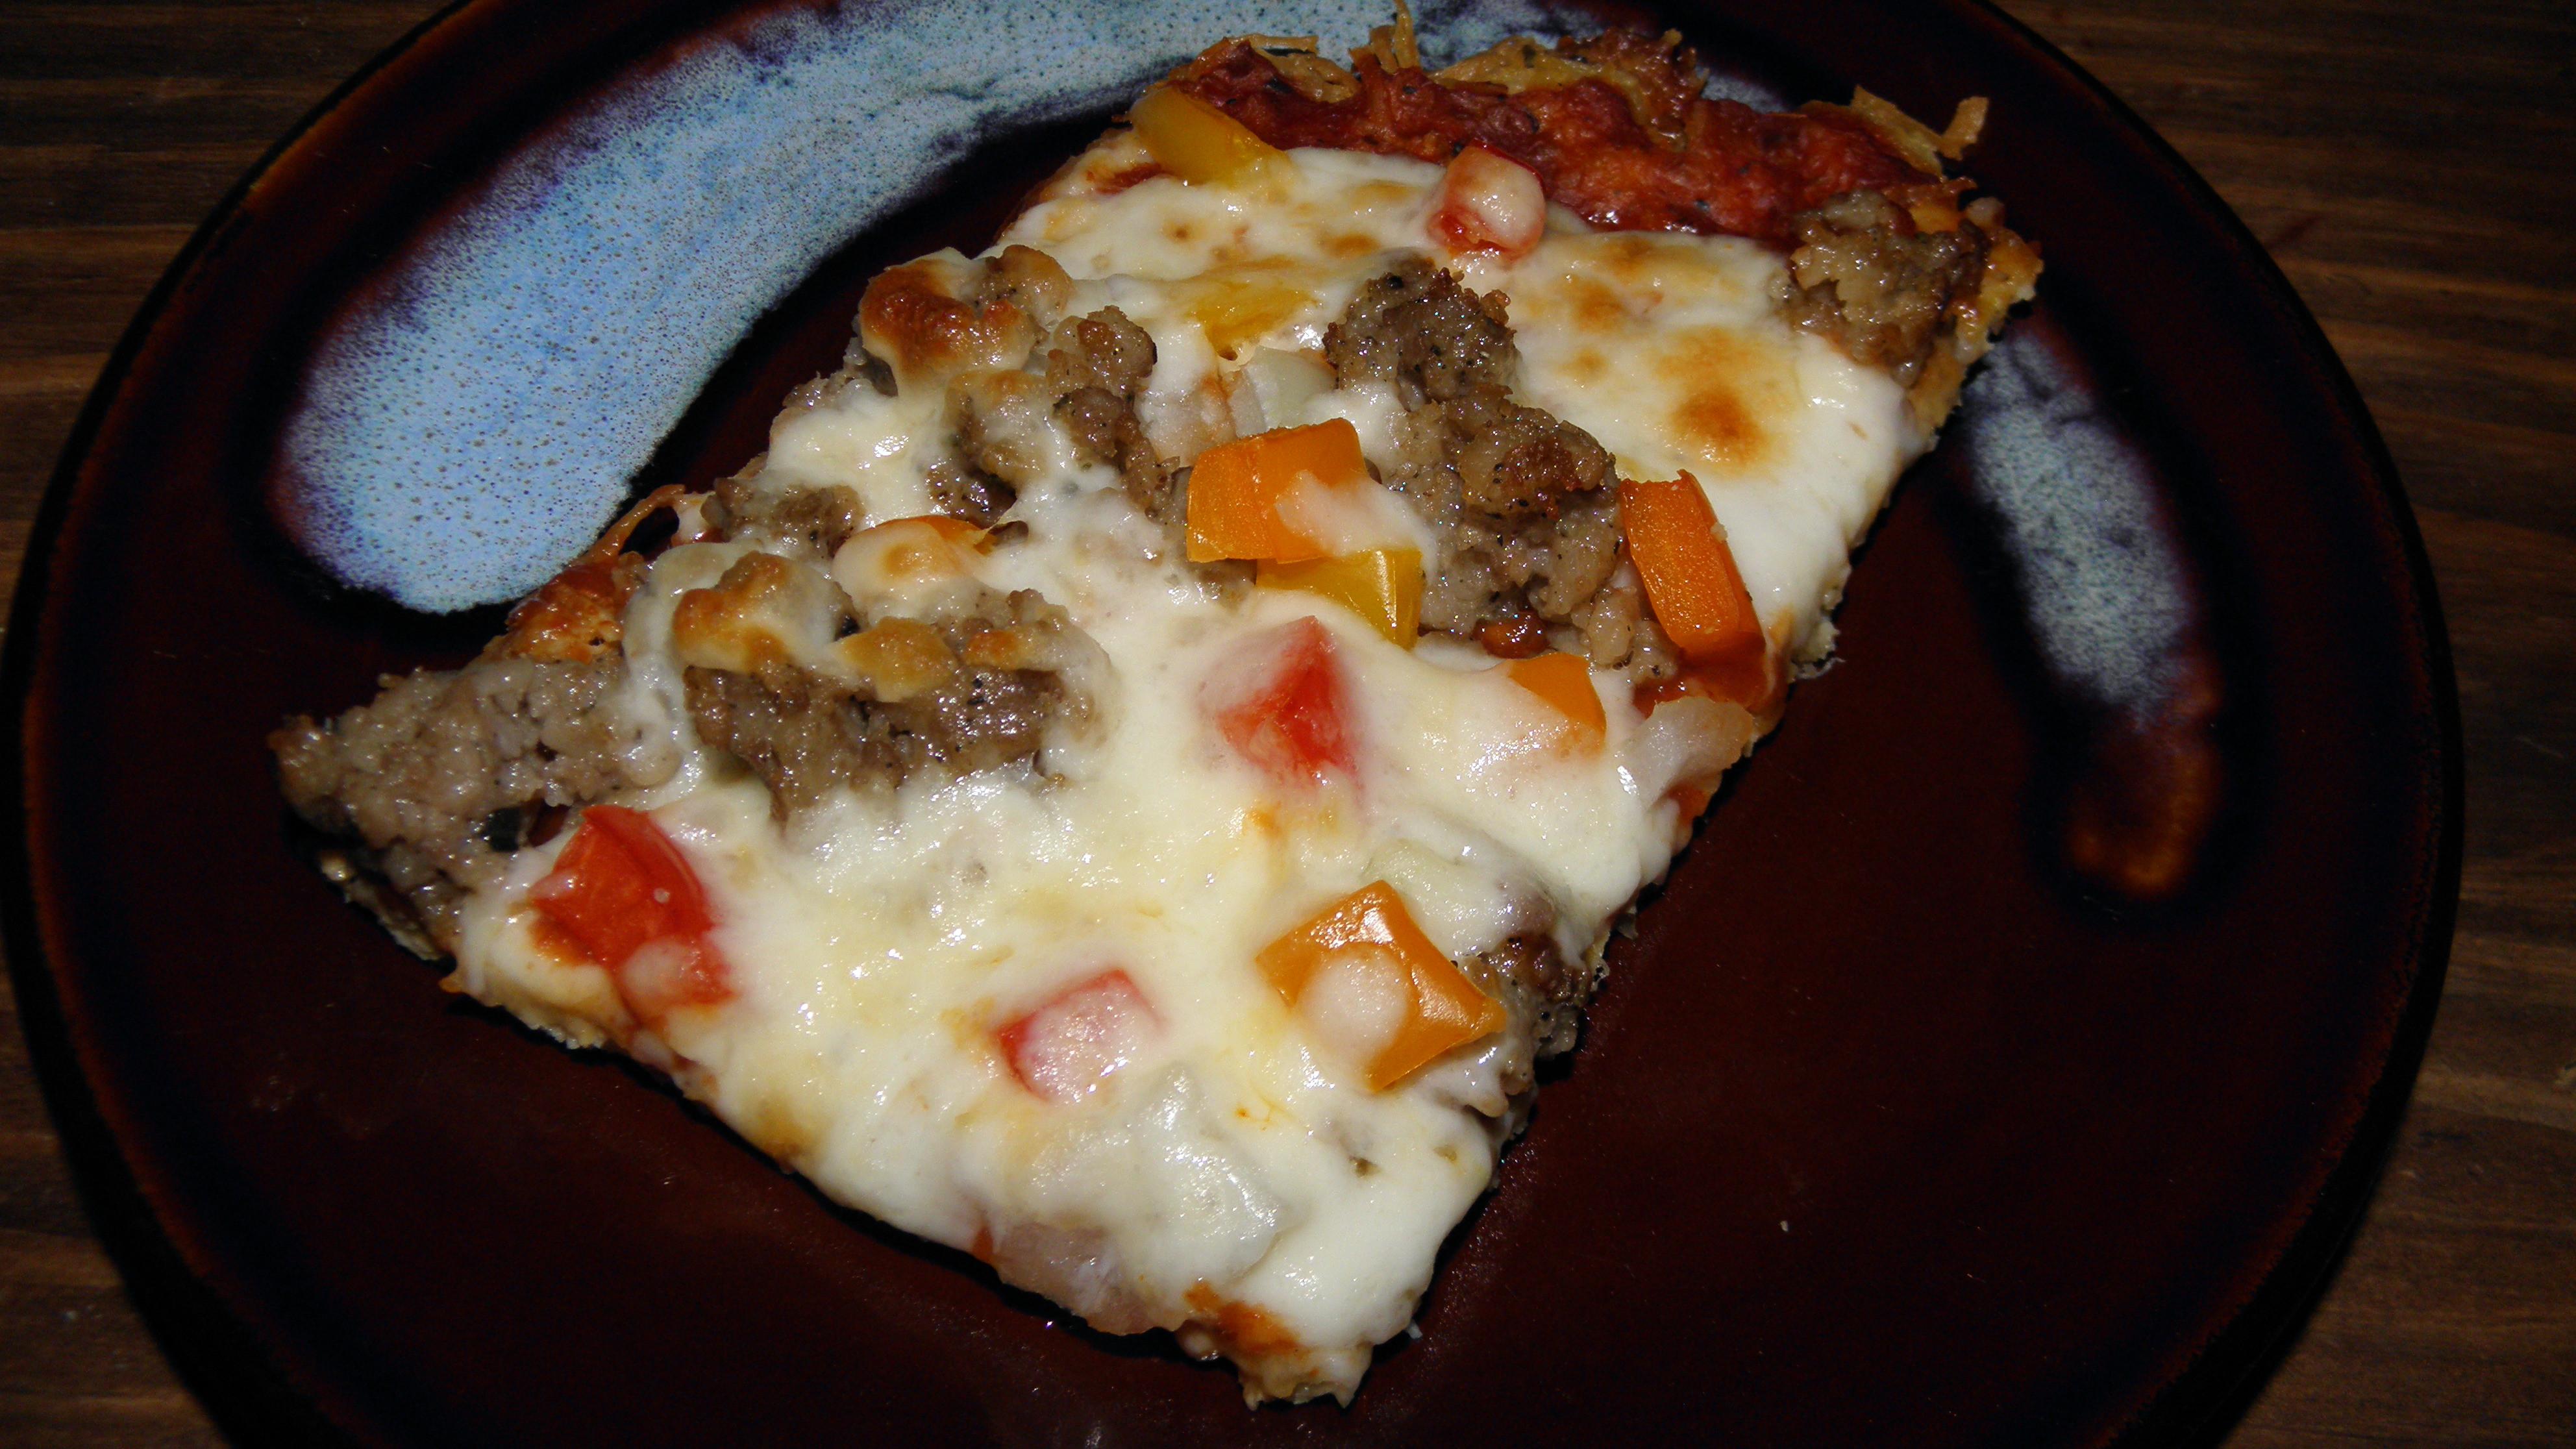 Chicken Crust Pizza Keto  Keto Chicken Crust Pizza Our Homesteading Journey